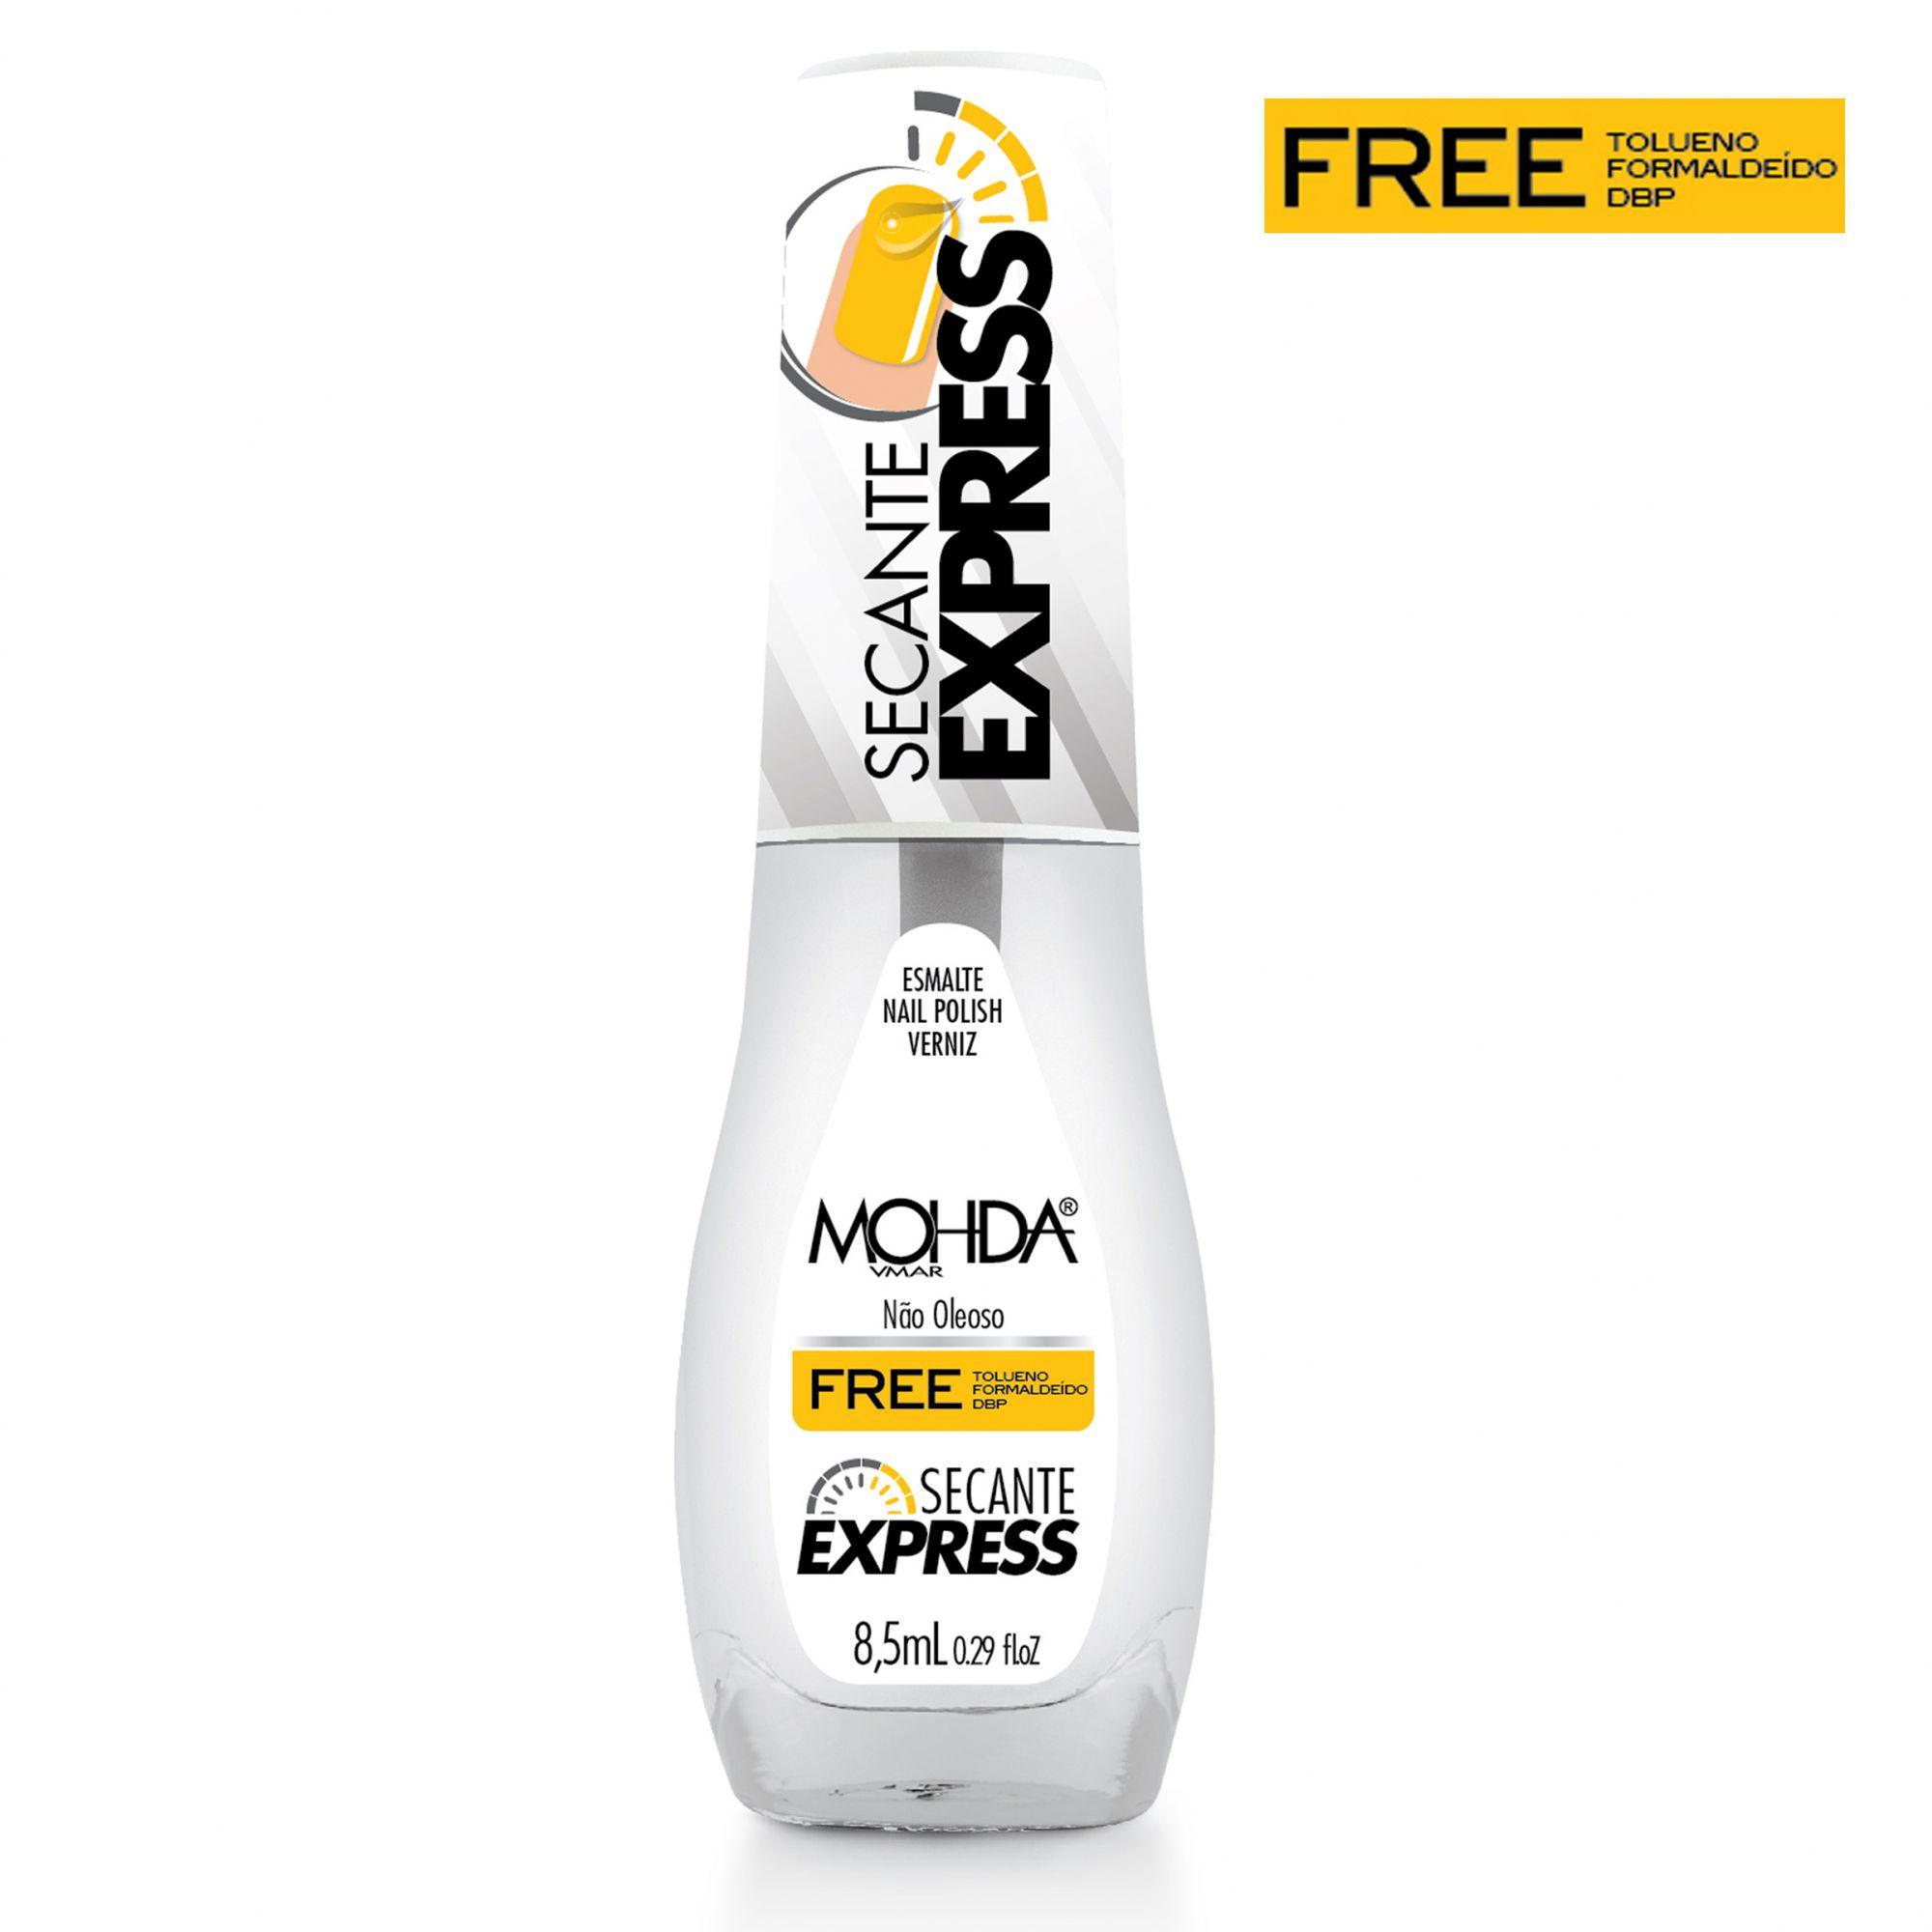 ATACADO - Secante Express 36 peças + brinde  - E-Mohda